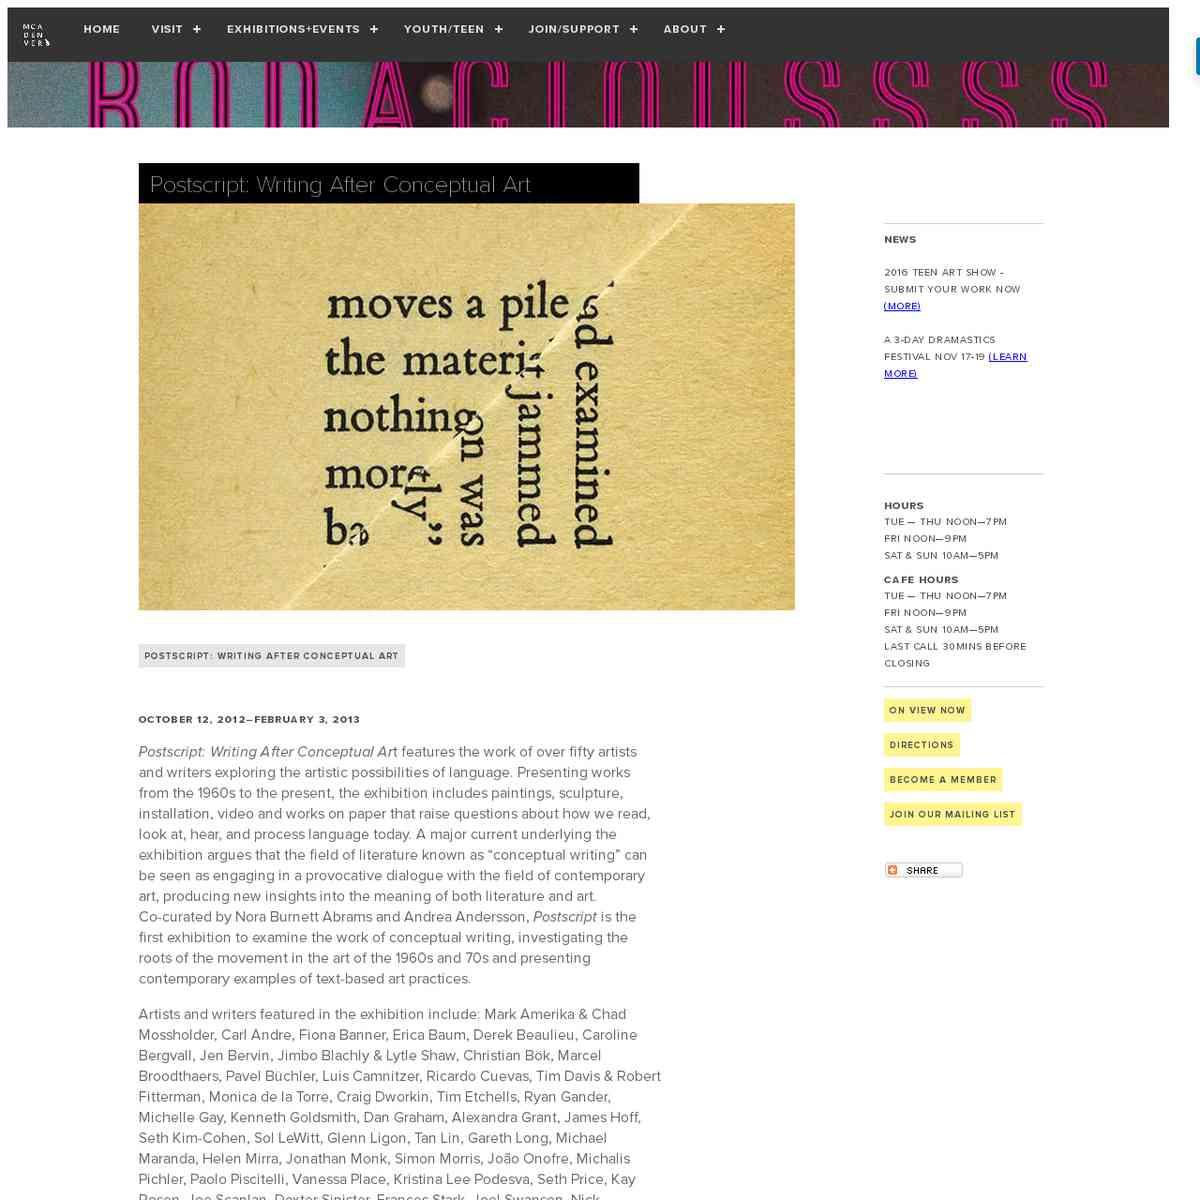 Postscript: Writing After Conceptual Art